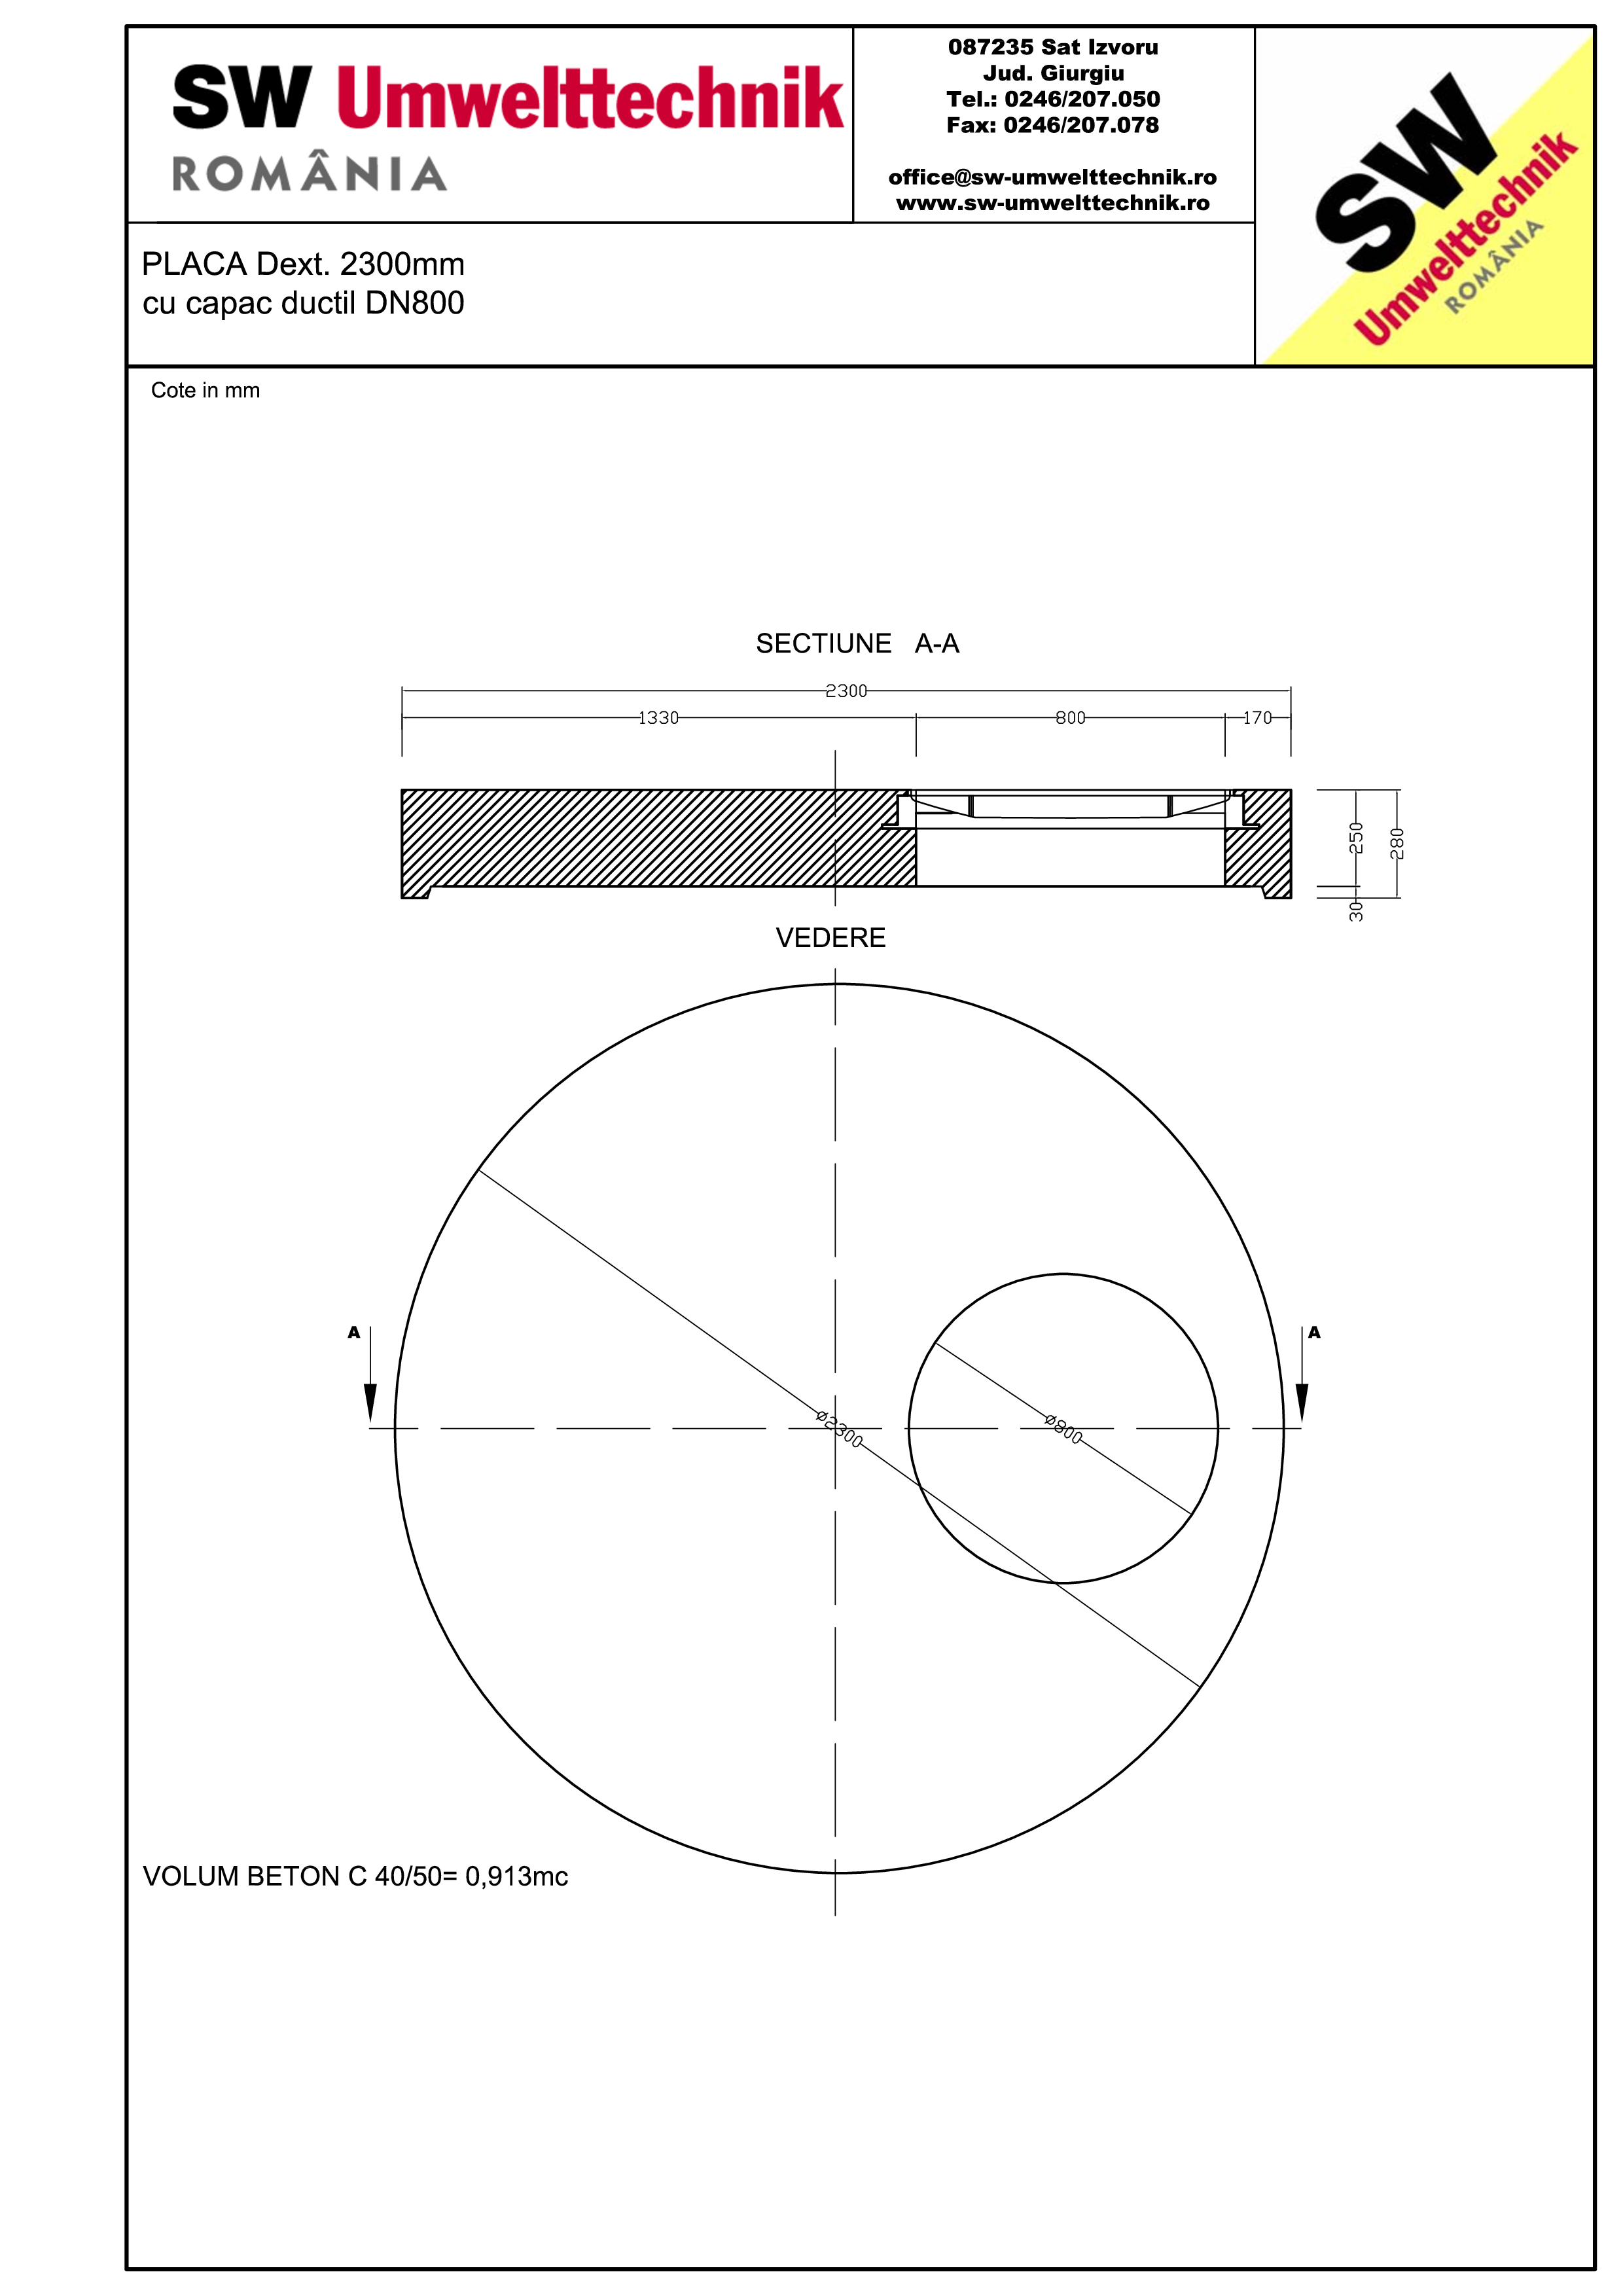 Pagina 1 - CAD-PDF Placa Dext.2300 H250 cu capac ductil DN800 SW UMWELTTECHNIK Detaliu de produs